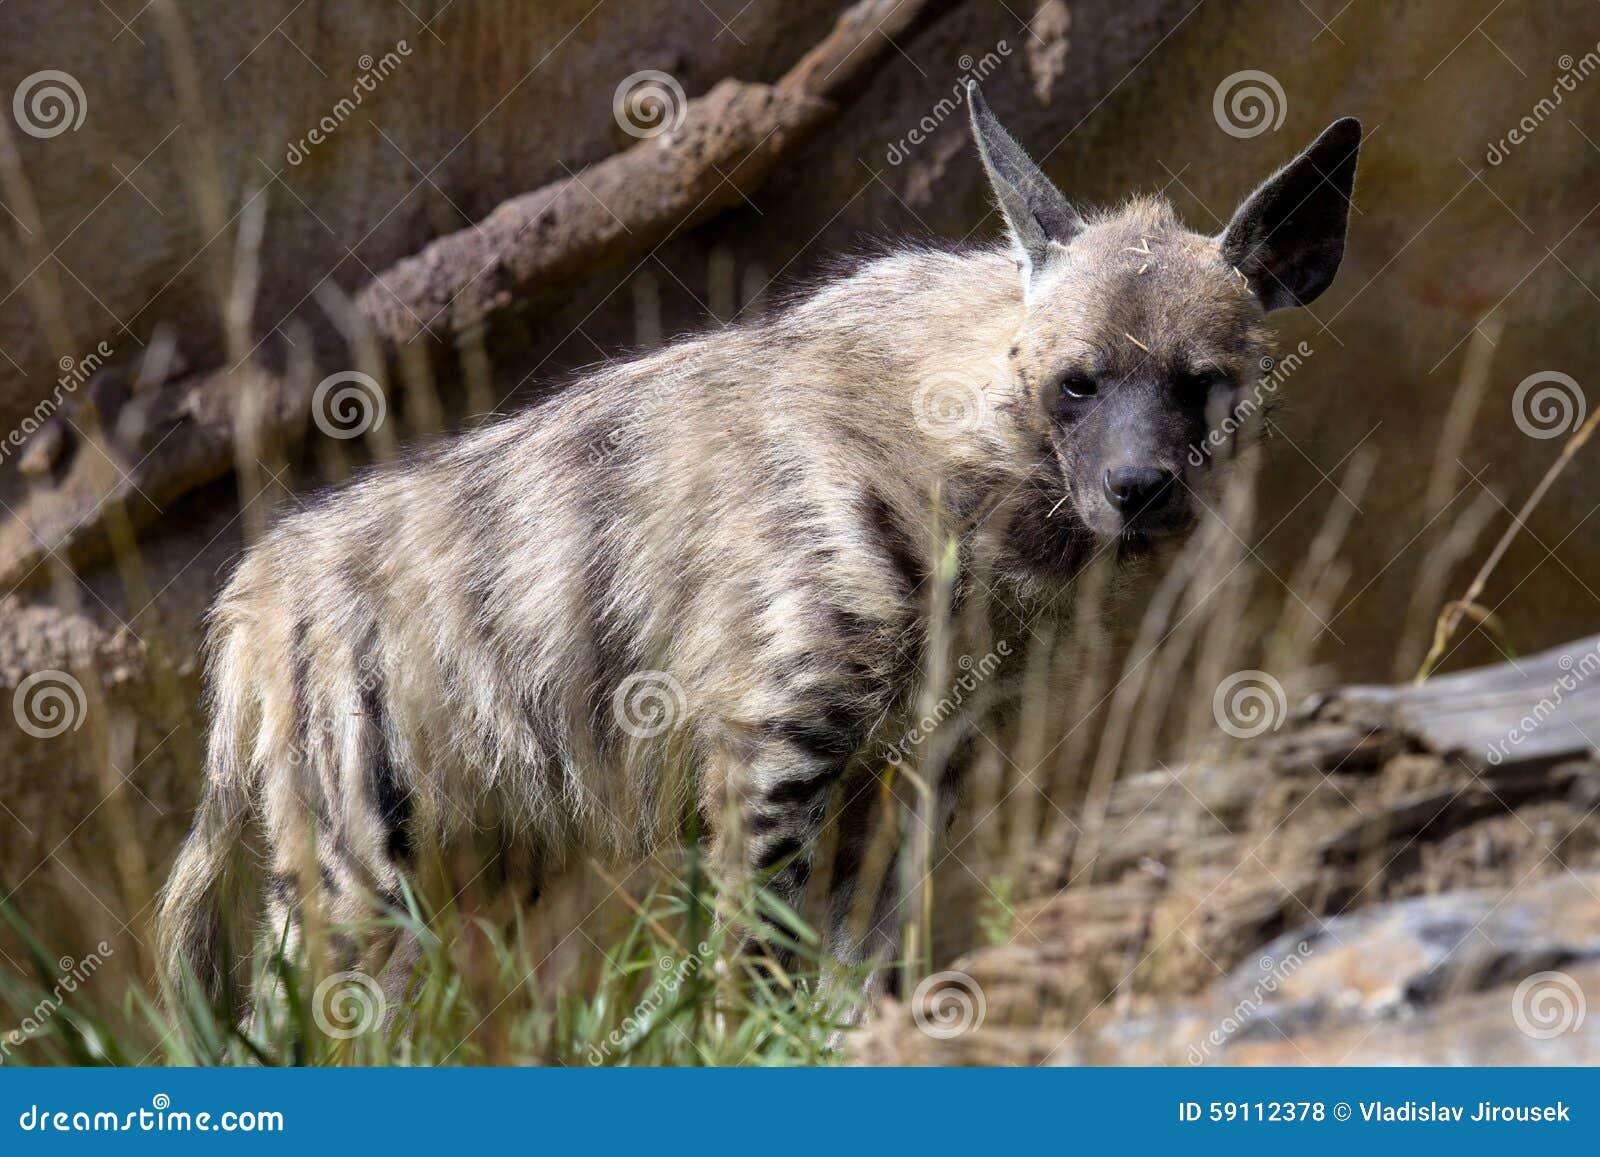 镶边鬣狗Hyaena Hyaena,观察周围